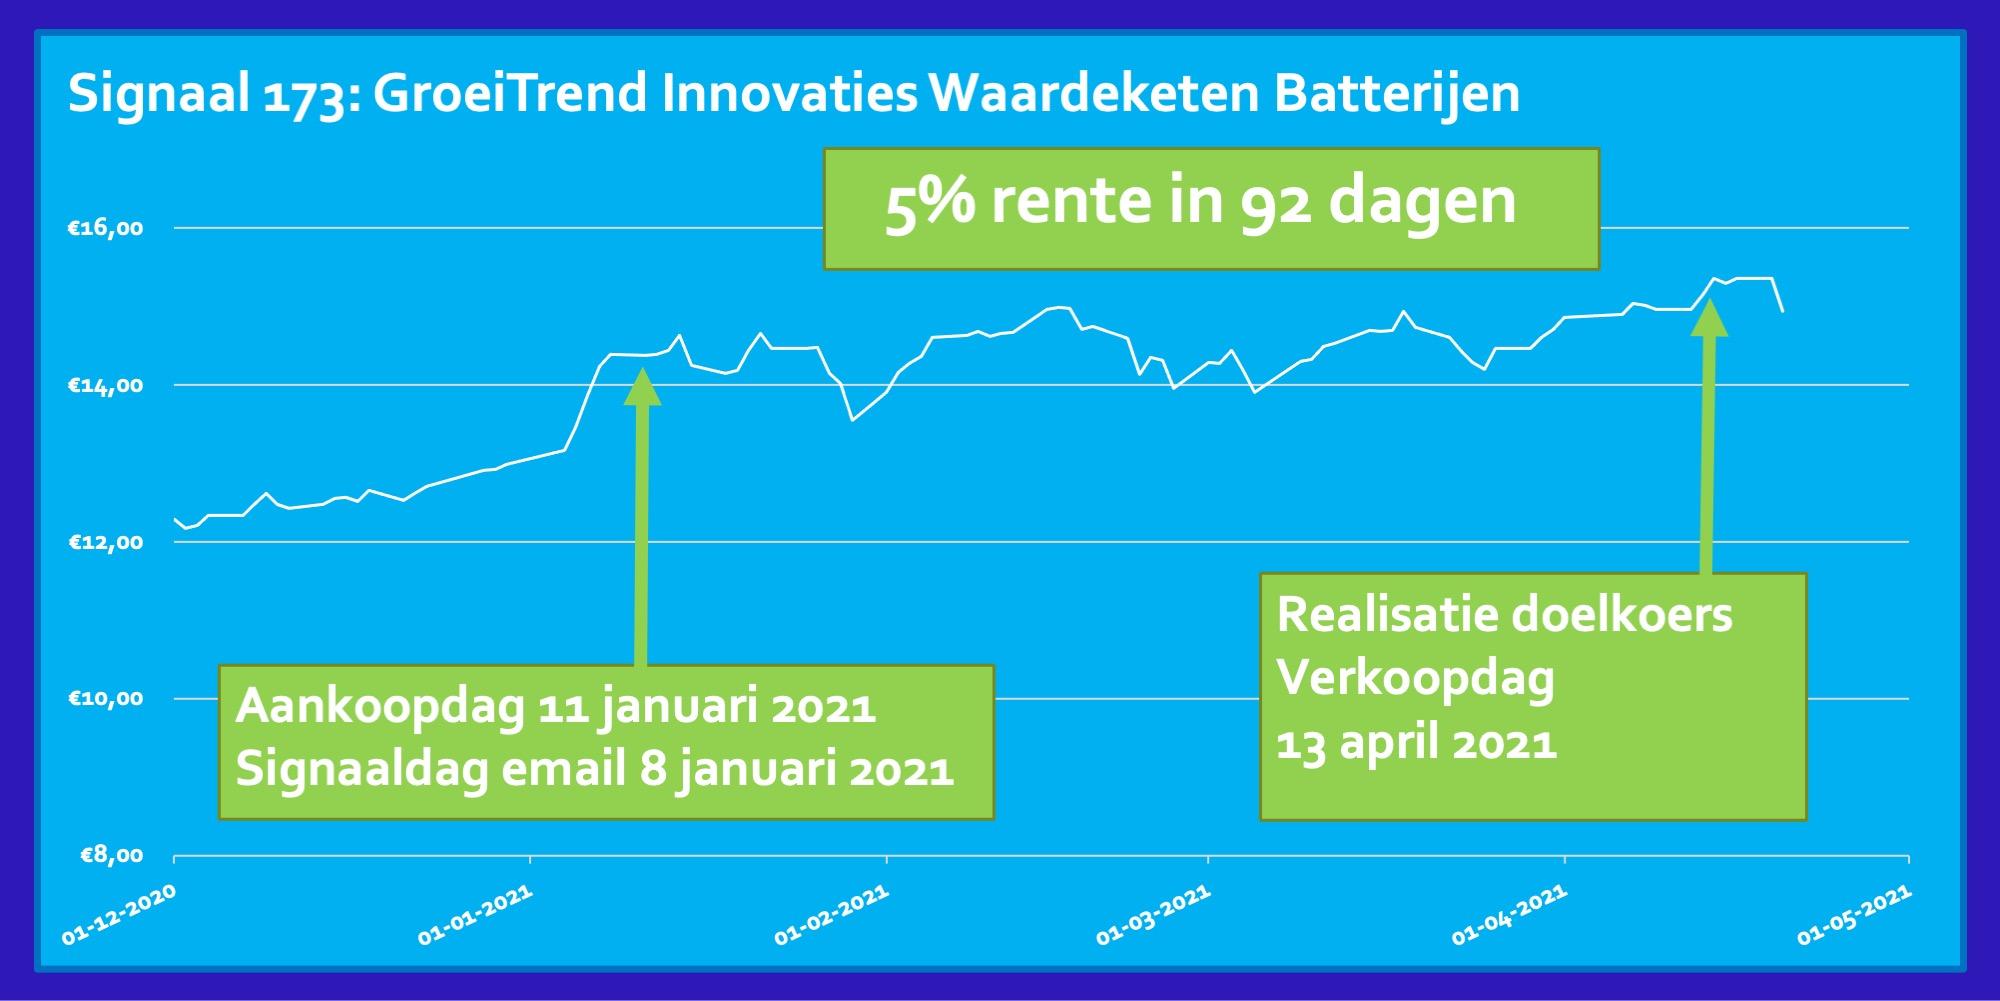 Trend ETF Innovaties Waardeketen Batterijen rendement 5 procent in 92 dagen